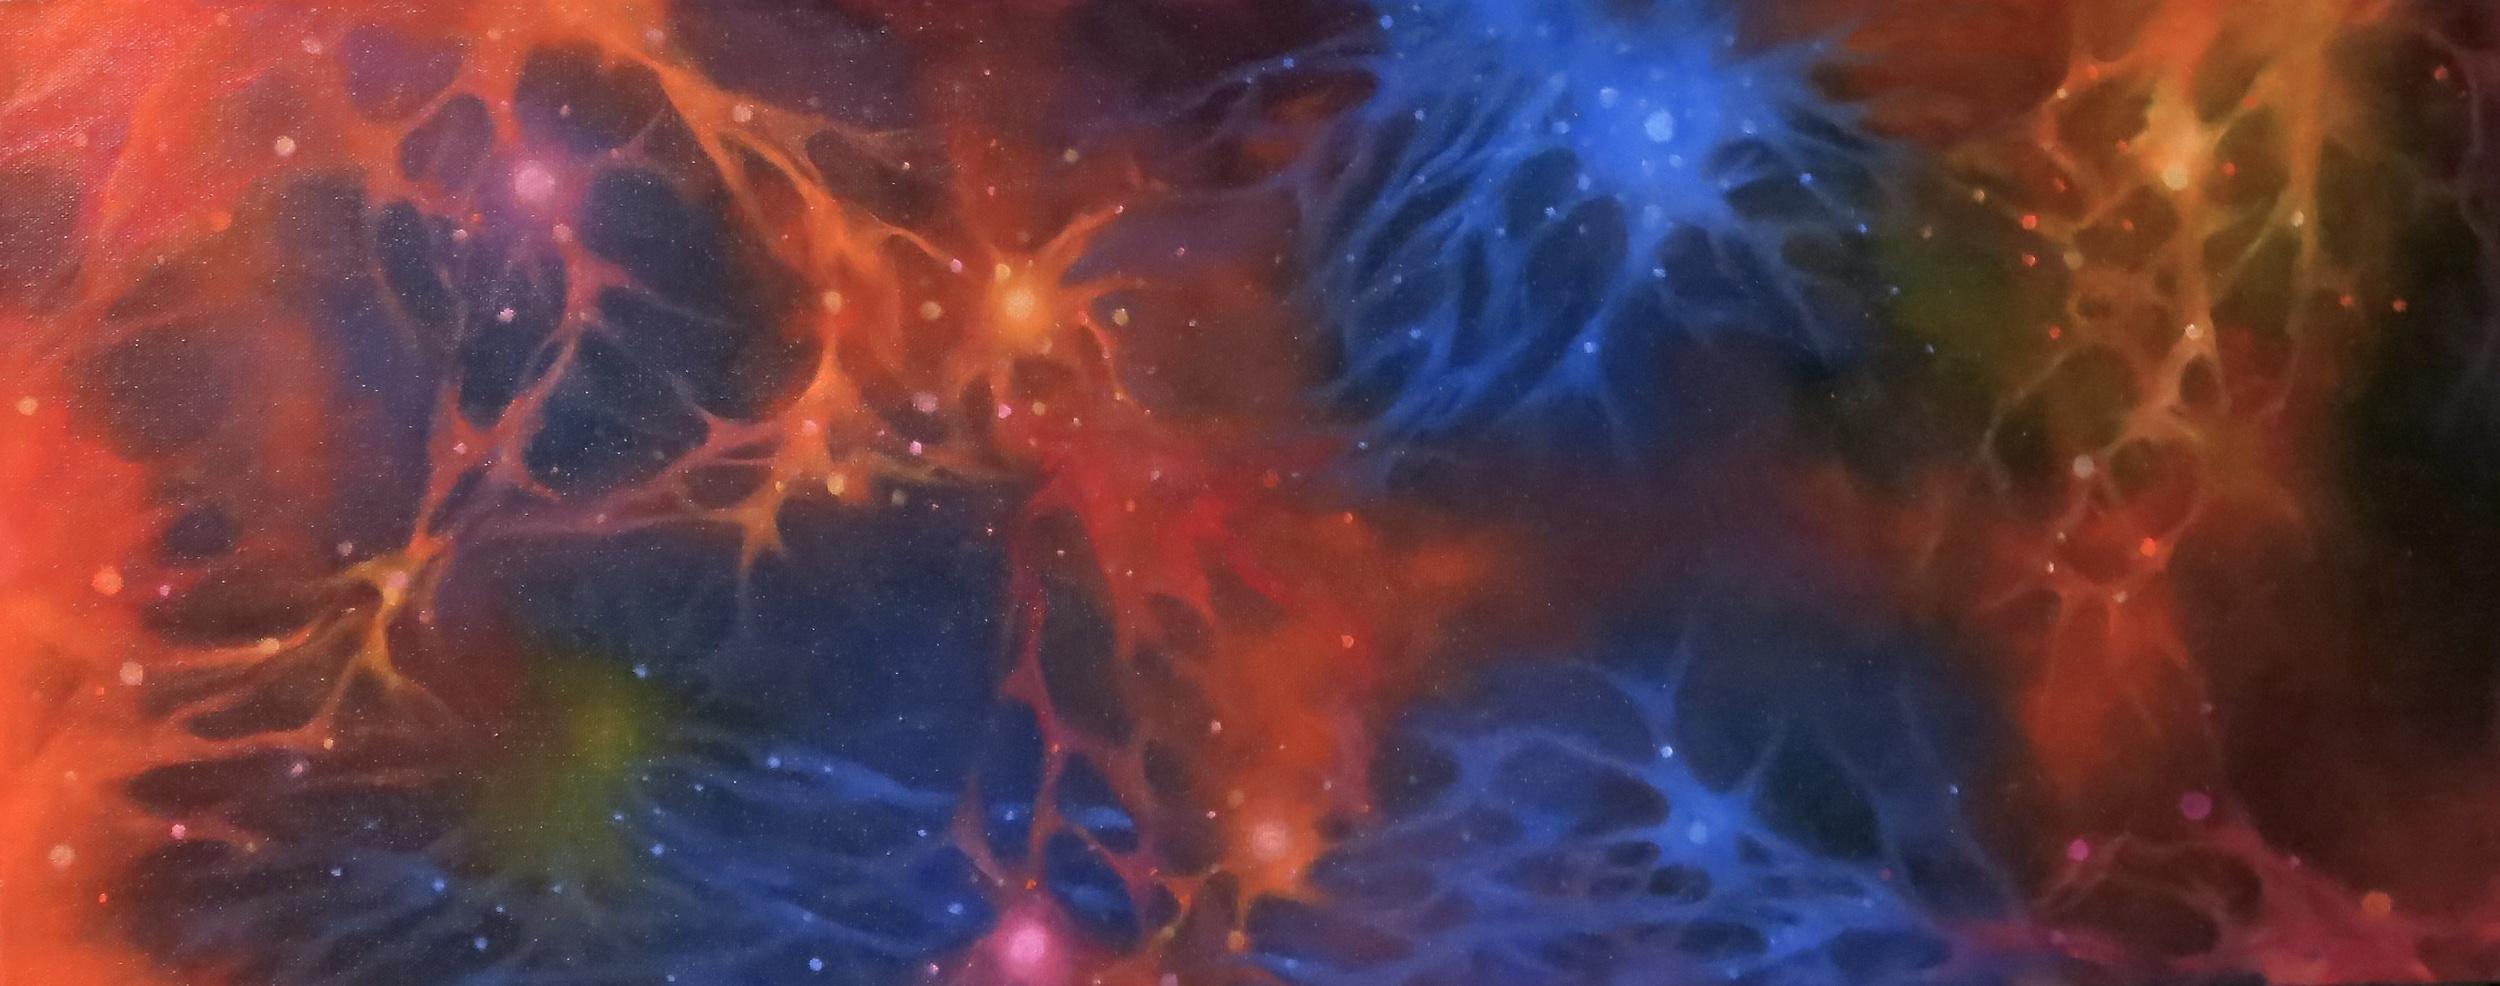 Celestial Synapses III